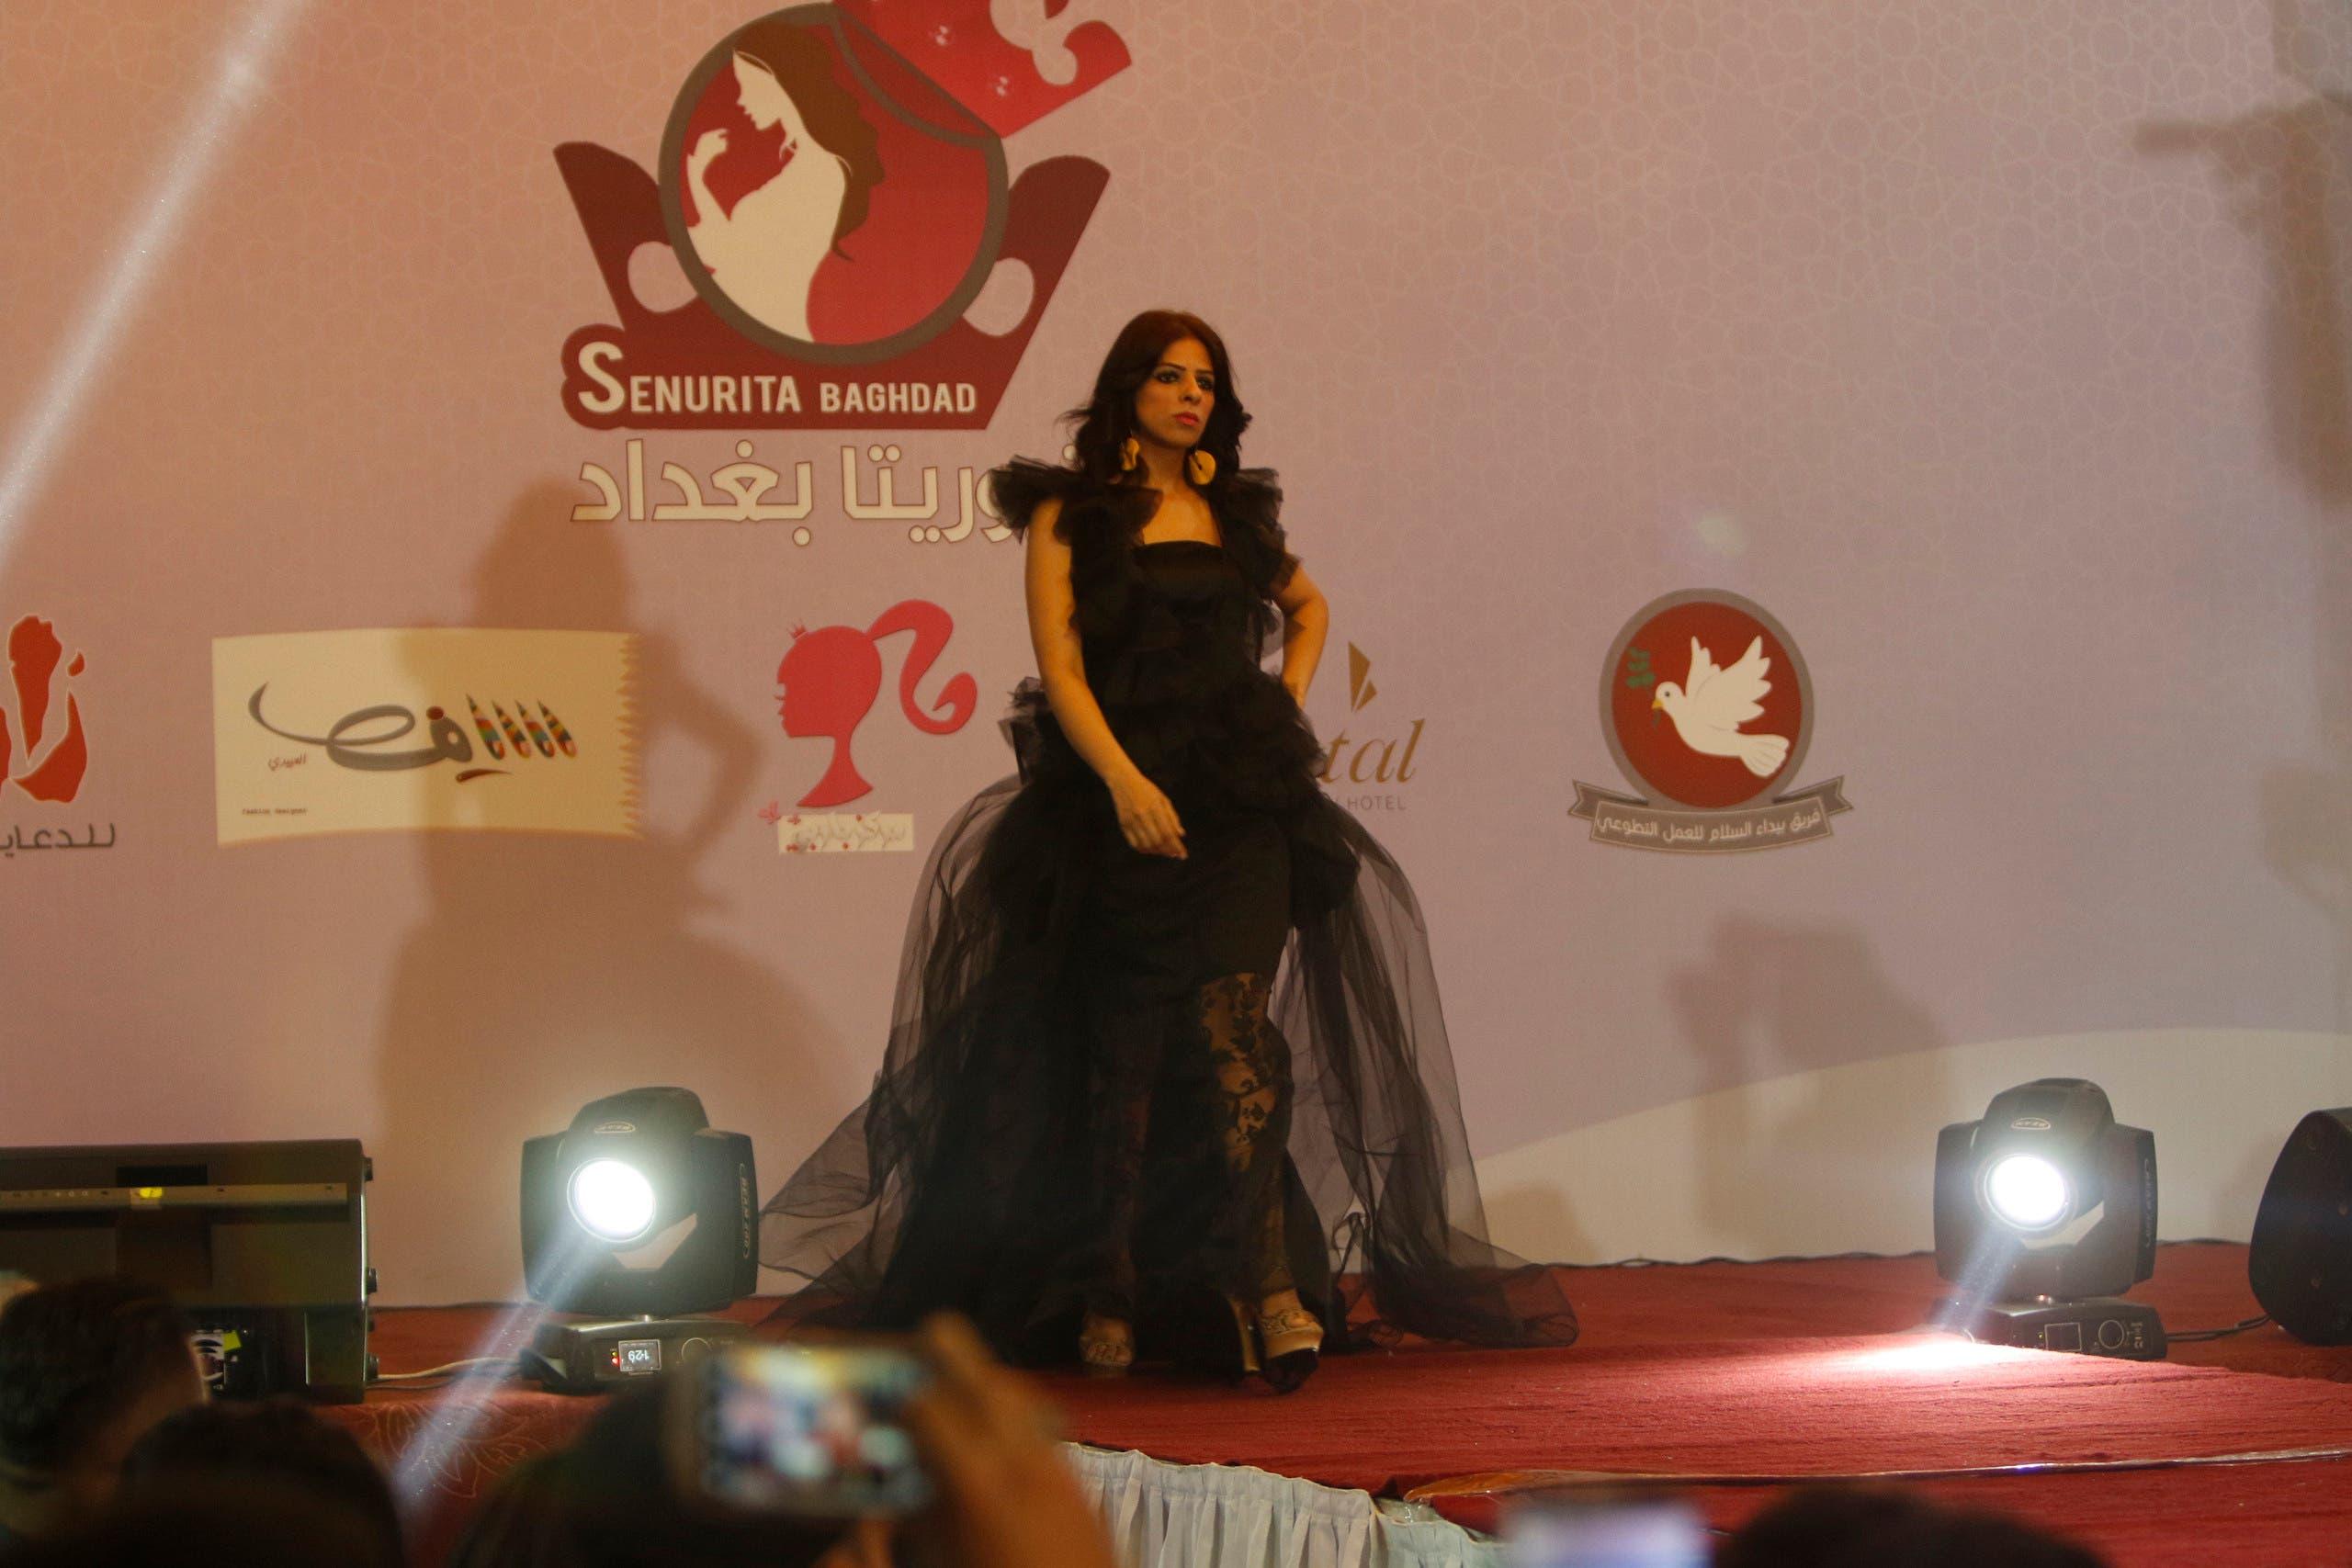 Forget ISIS: Iraq models strut down the catwalk